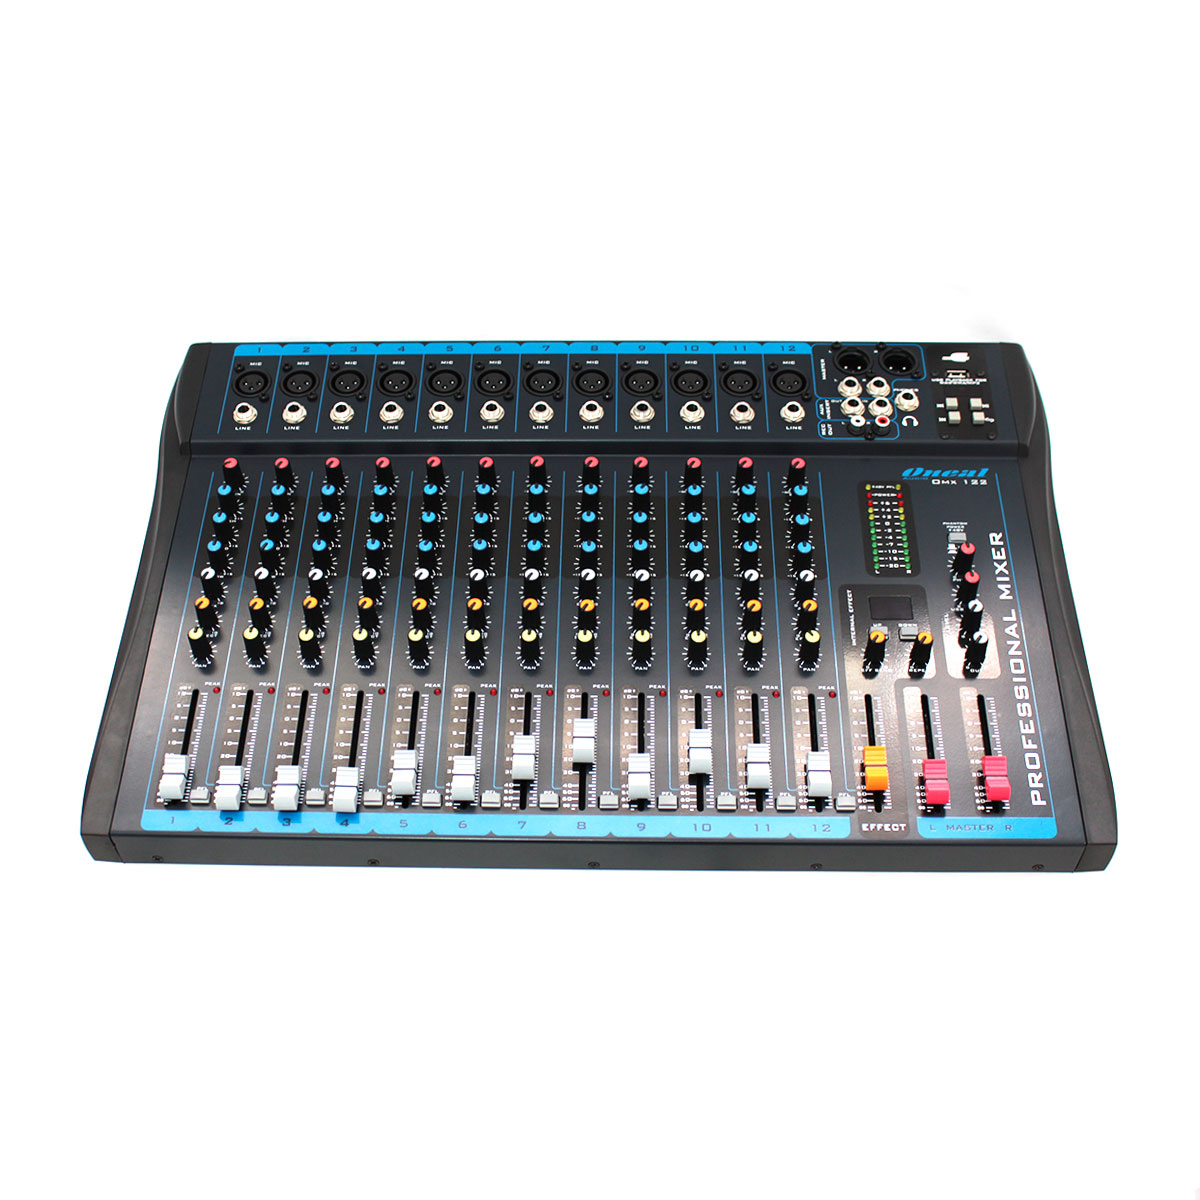 OMX122 - Mesa de Som / Mixer 12 Canais c/ USB OMX 122 - Oneal